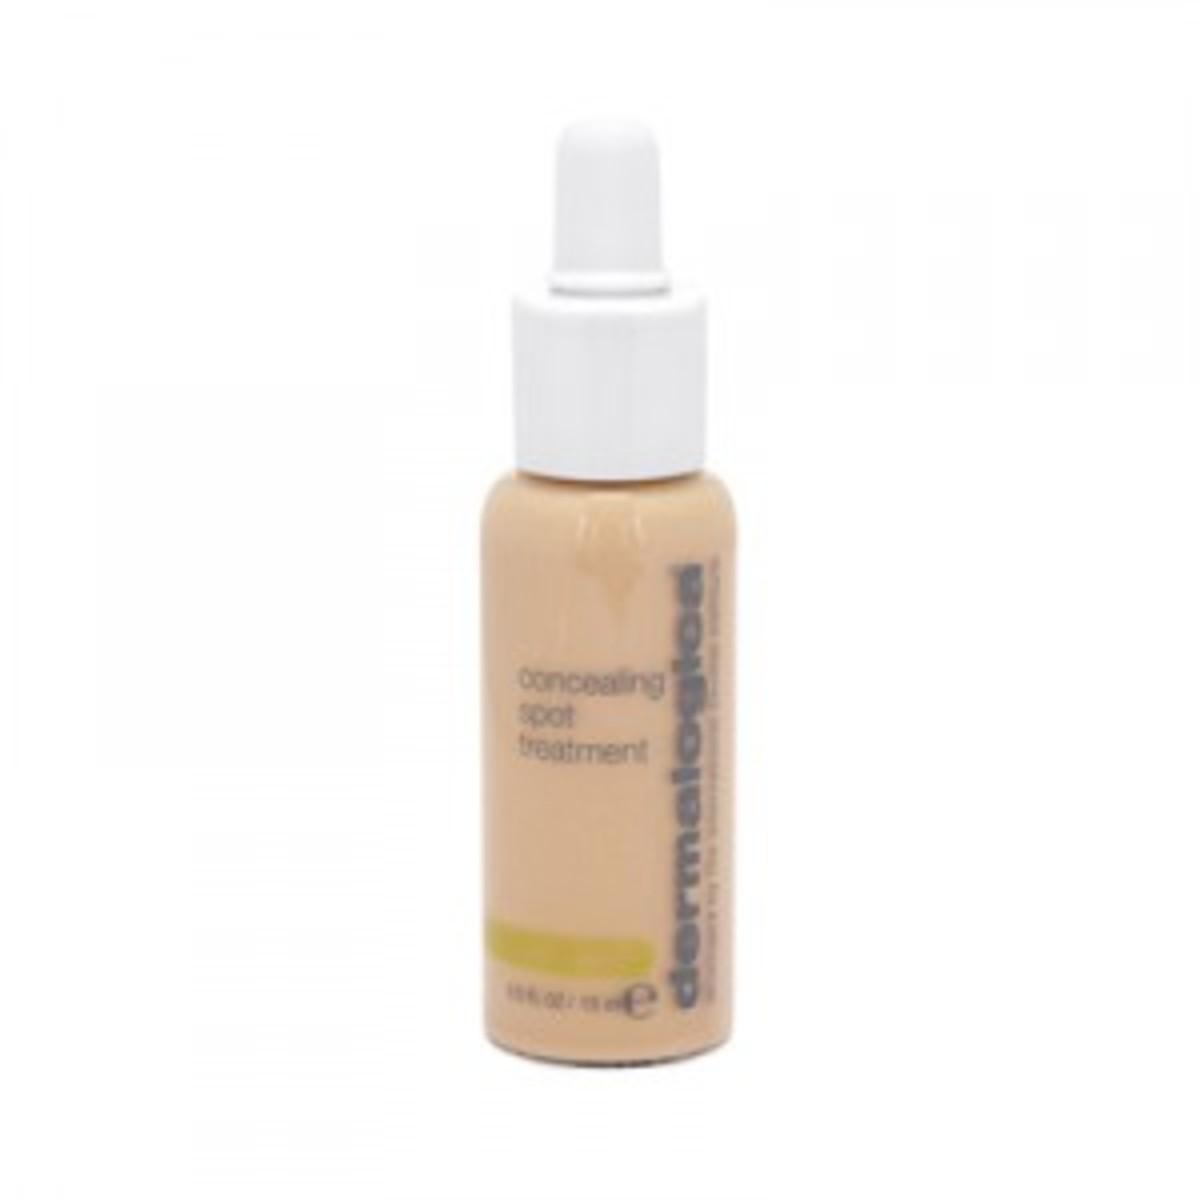 dermalogica-concealing-spot-treatment-300x300